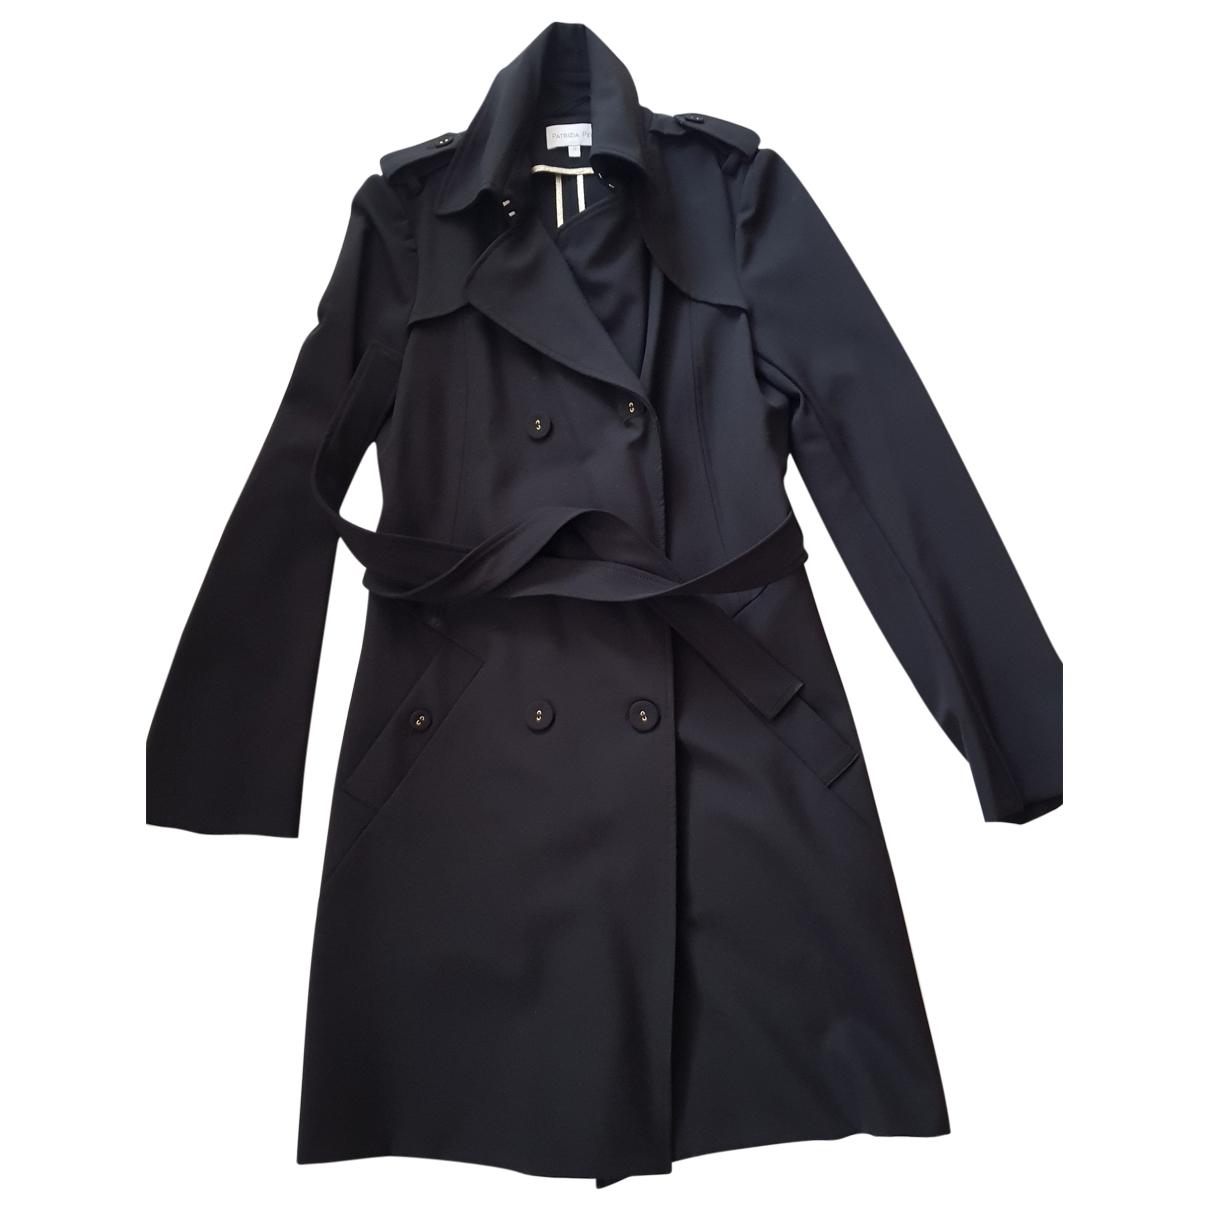 Patrizia Pepe \N Black coat for Women S International